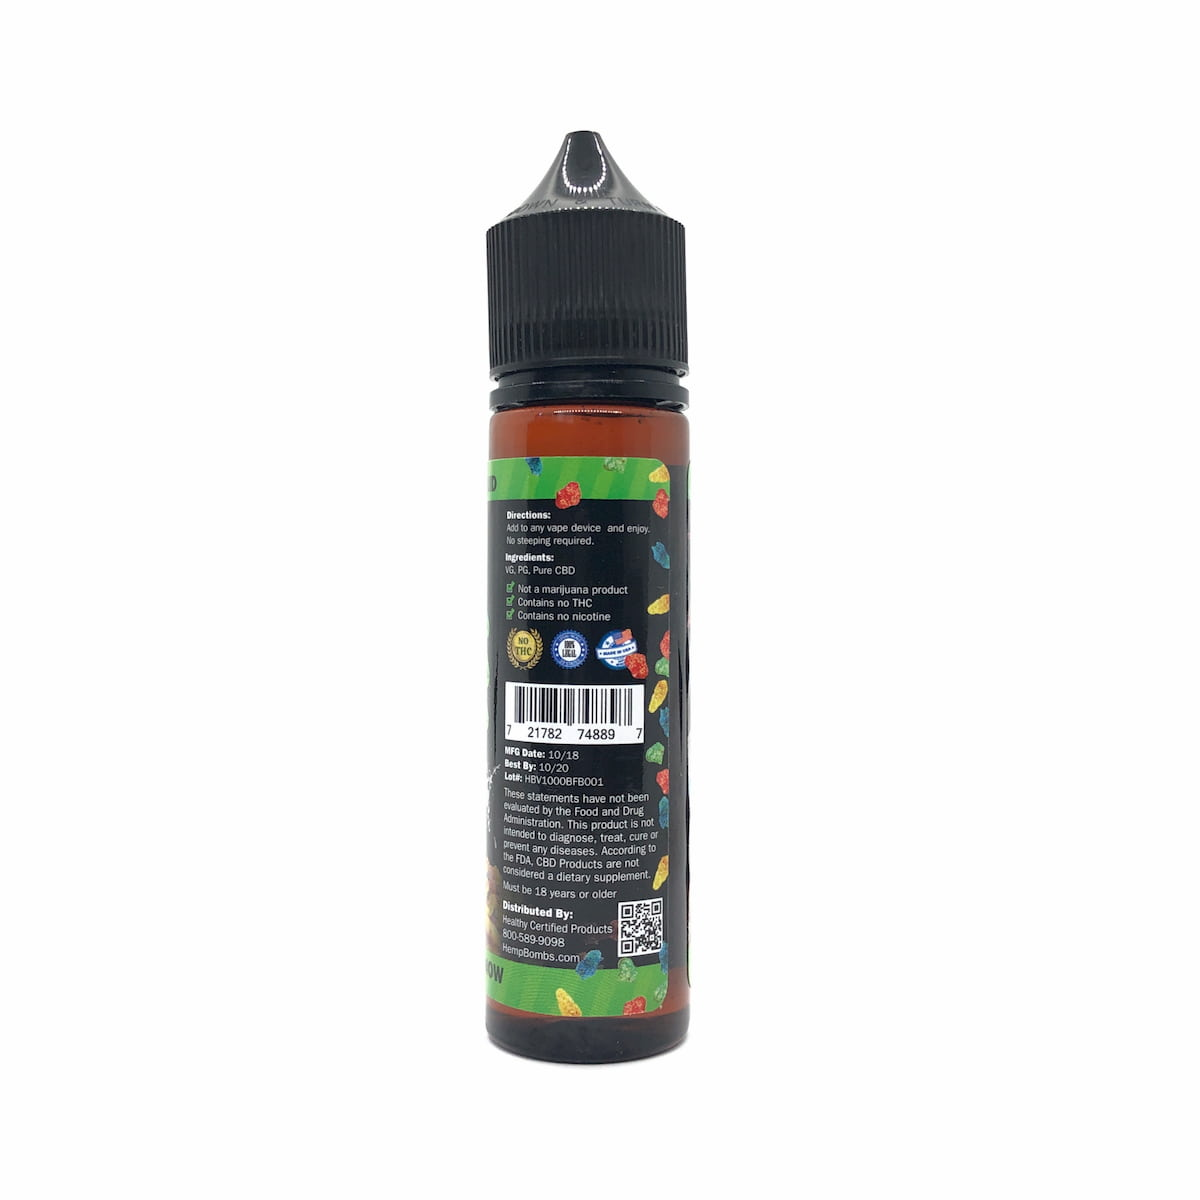 Hemp Bombs, CBD E-Liquid, Broad Spectrum THC-free, Bangin' Fruity Bedrock, 60ml, 1000mg of CBD2